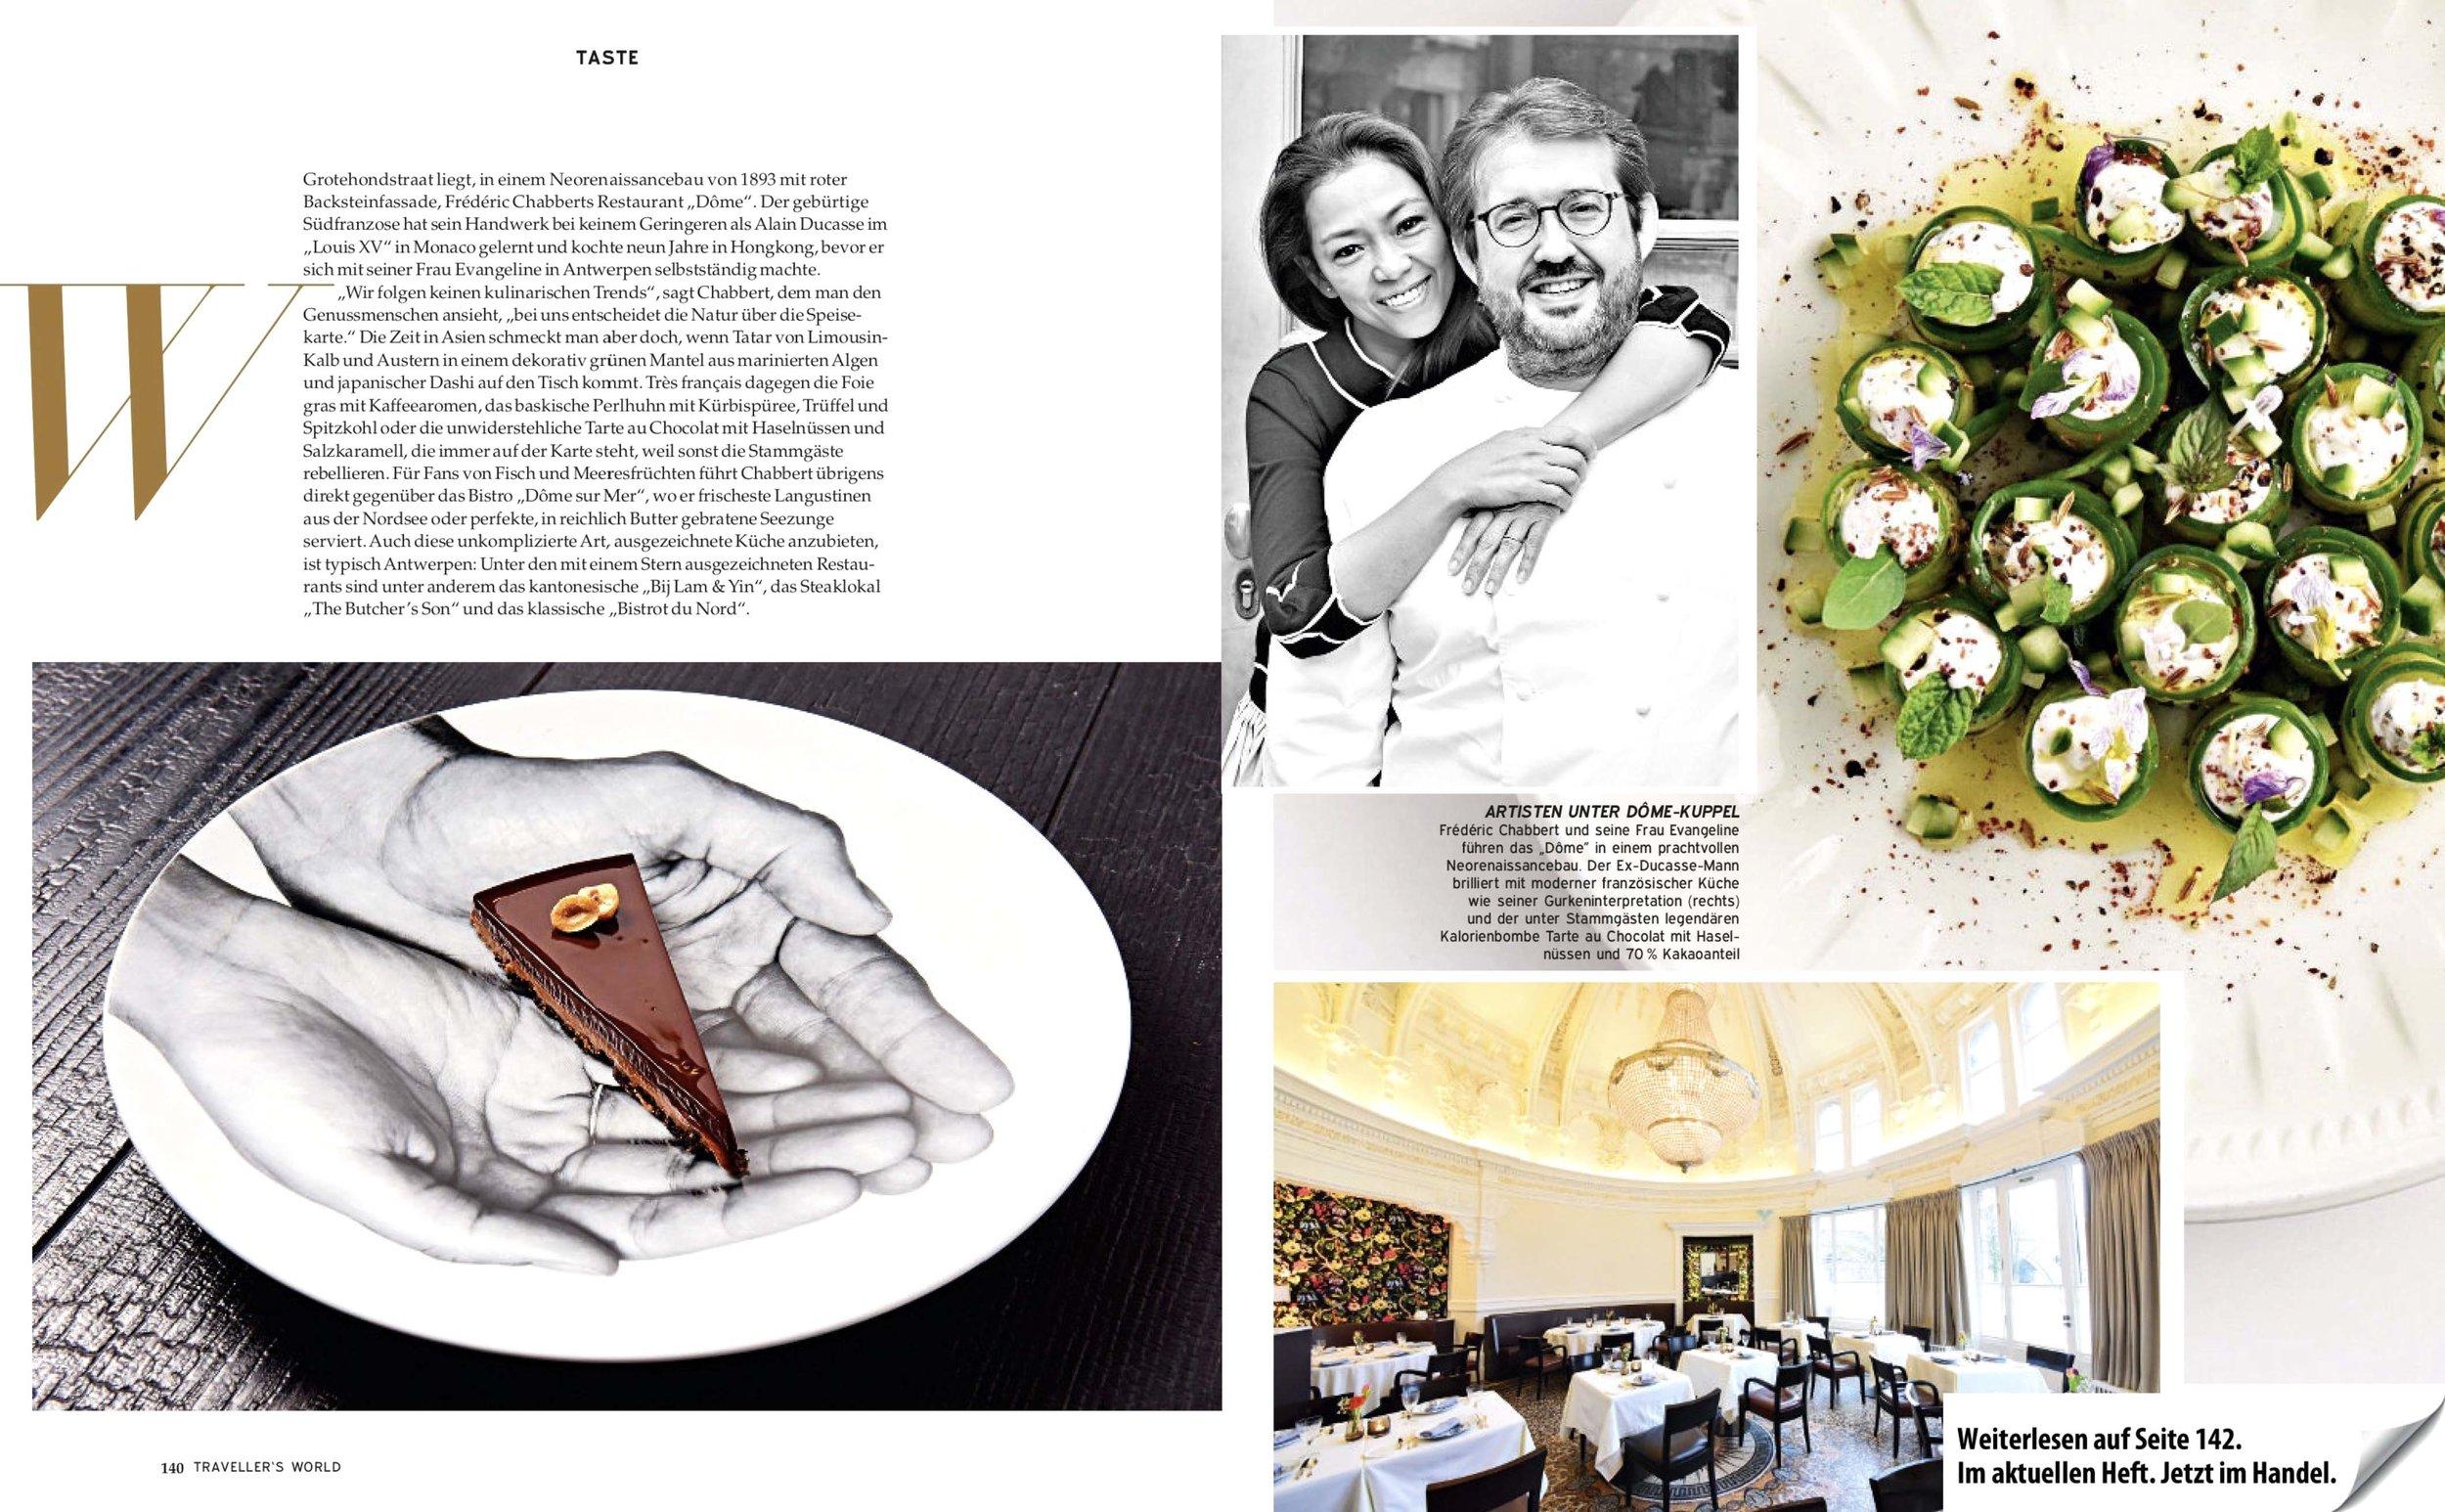 traveller's world antwerp antwerpen best  bart albrecht dôme michelin michelinstar belgium fotograaf foodfotograaf foodphotographer culinair culinary guide.jpg